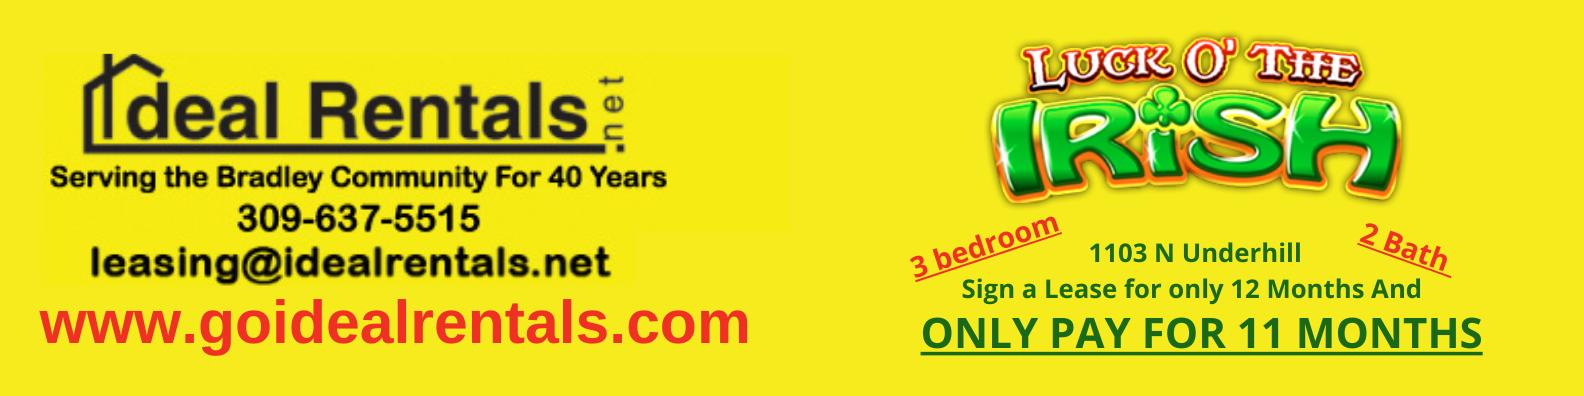 www.goidealrentals.com_.png